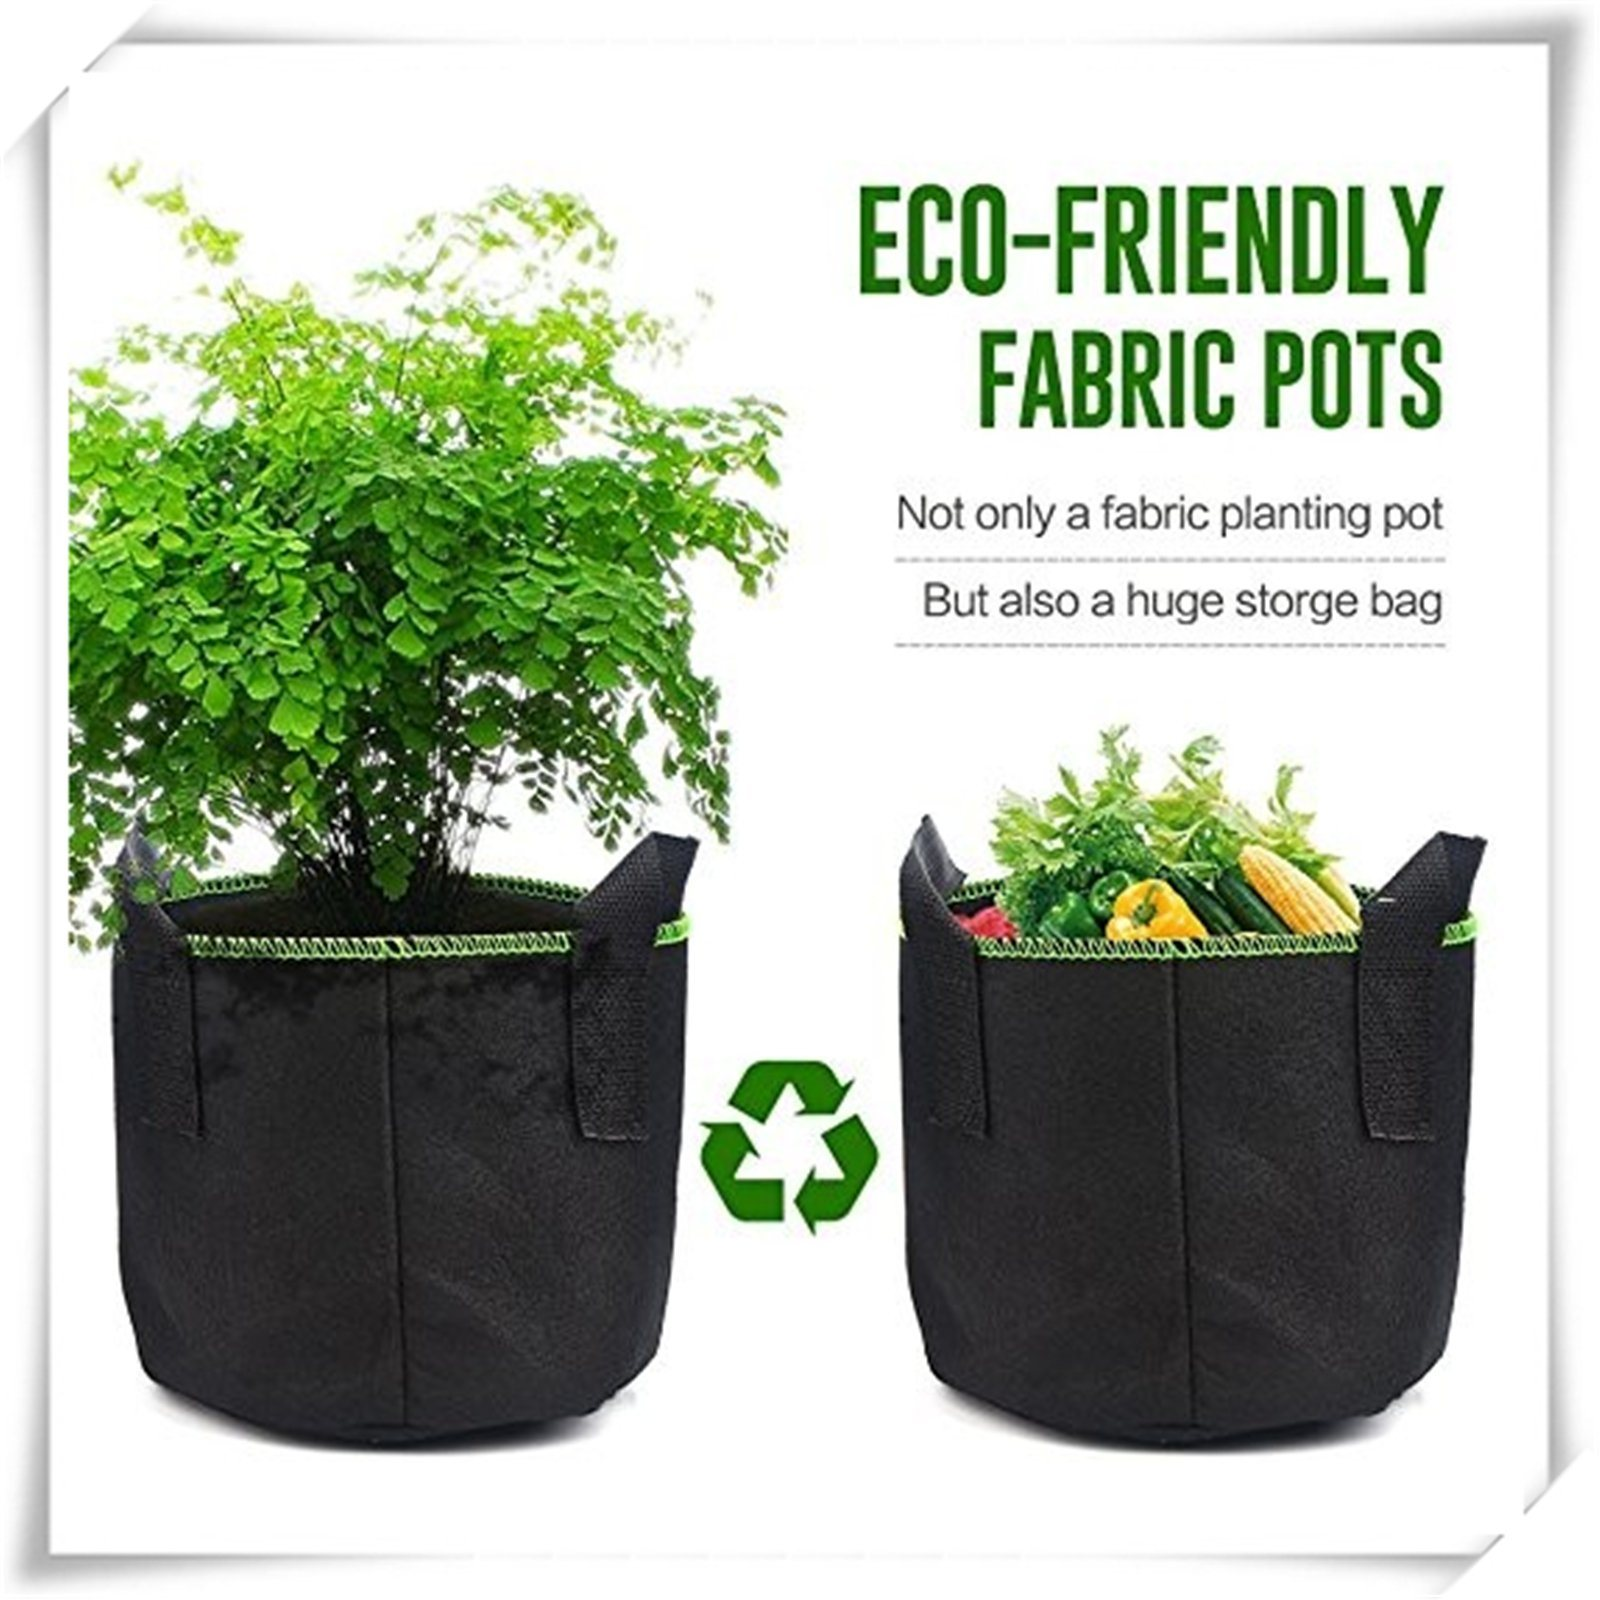 Hot Item 5 Packs Round Fabric Pots Breathable Felt Nursery Garden Planting Grow Bags